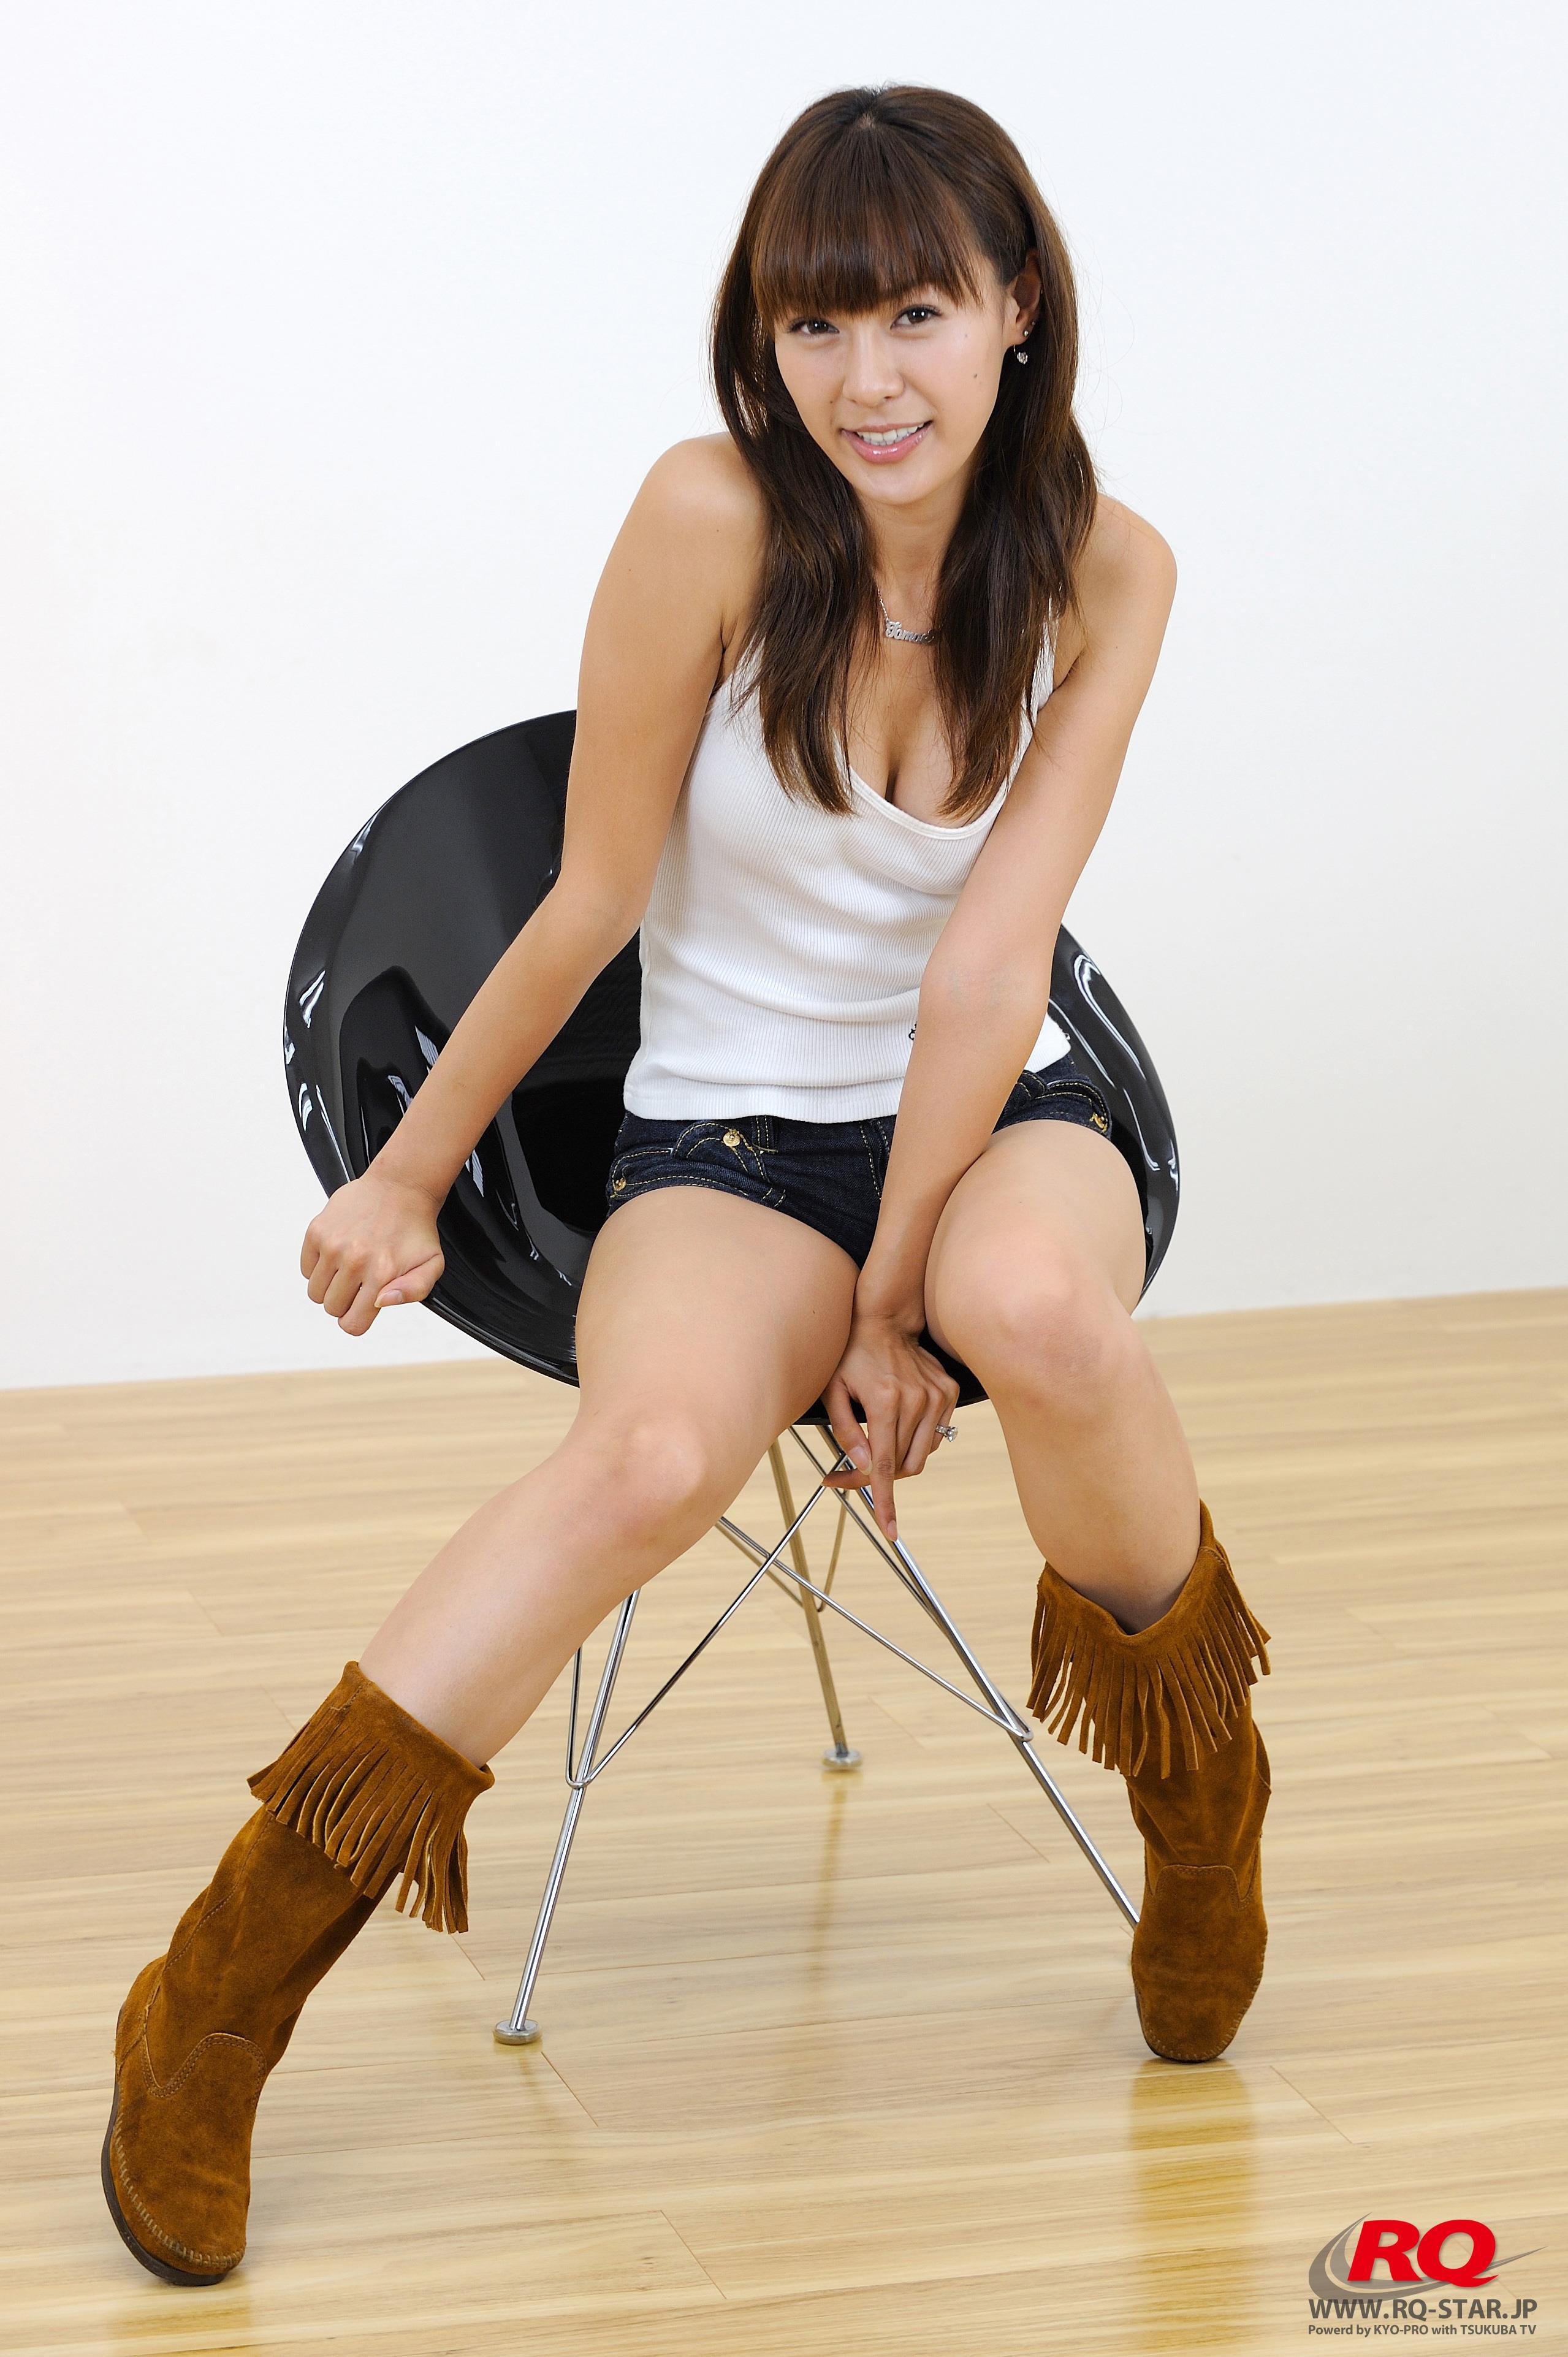 [RQ-STAR写真]NO.00124 なかがわともえ(中川知映,Tomoe Nakagawa)白色背心加牛仔热裤性感私房写真集